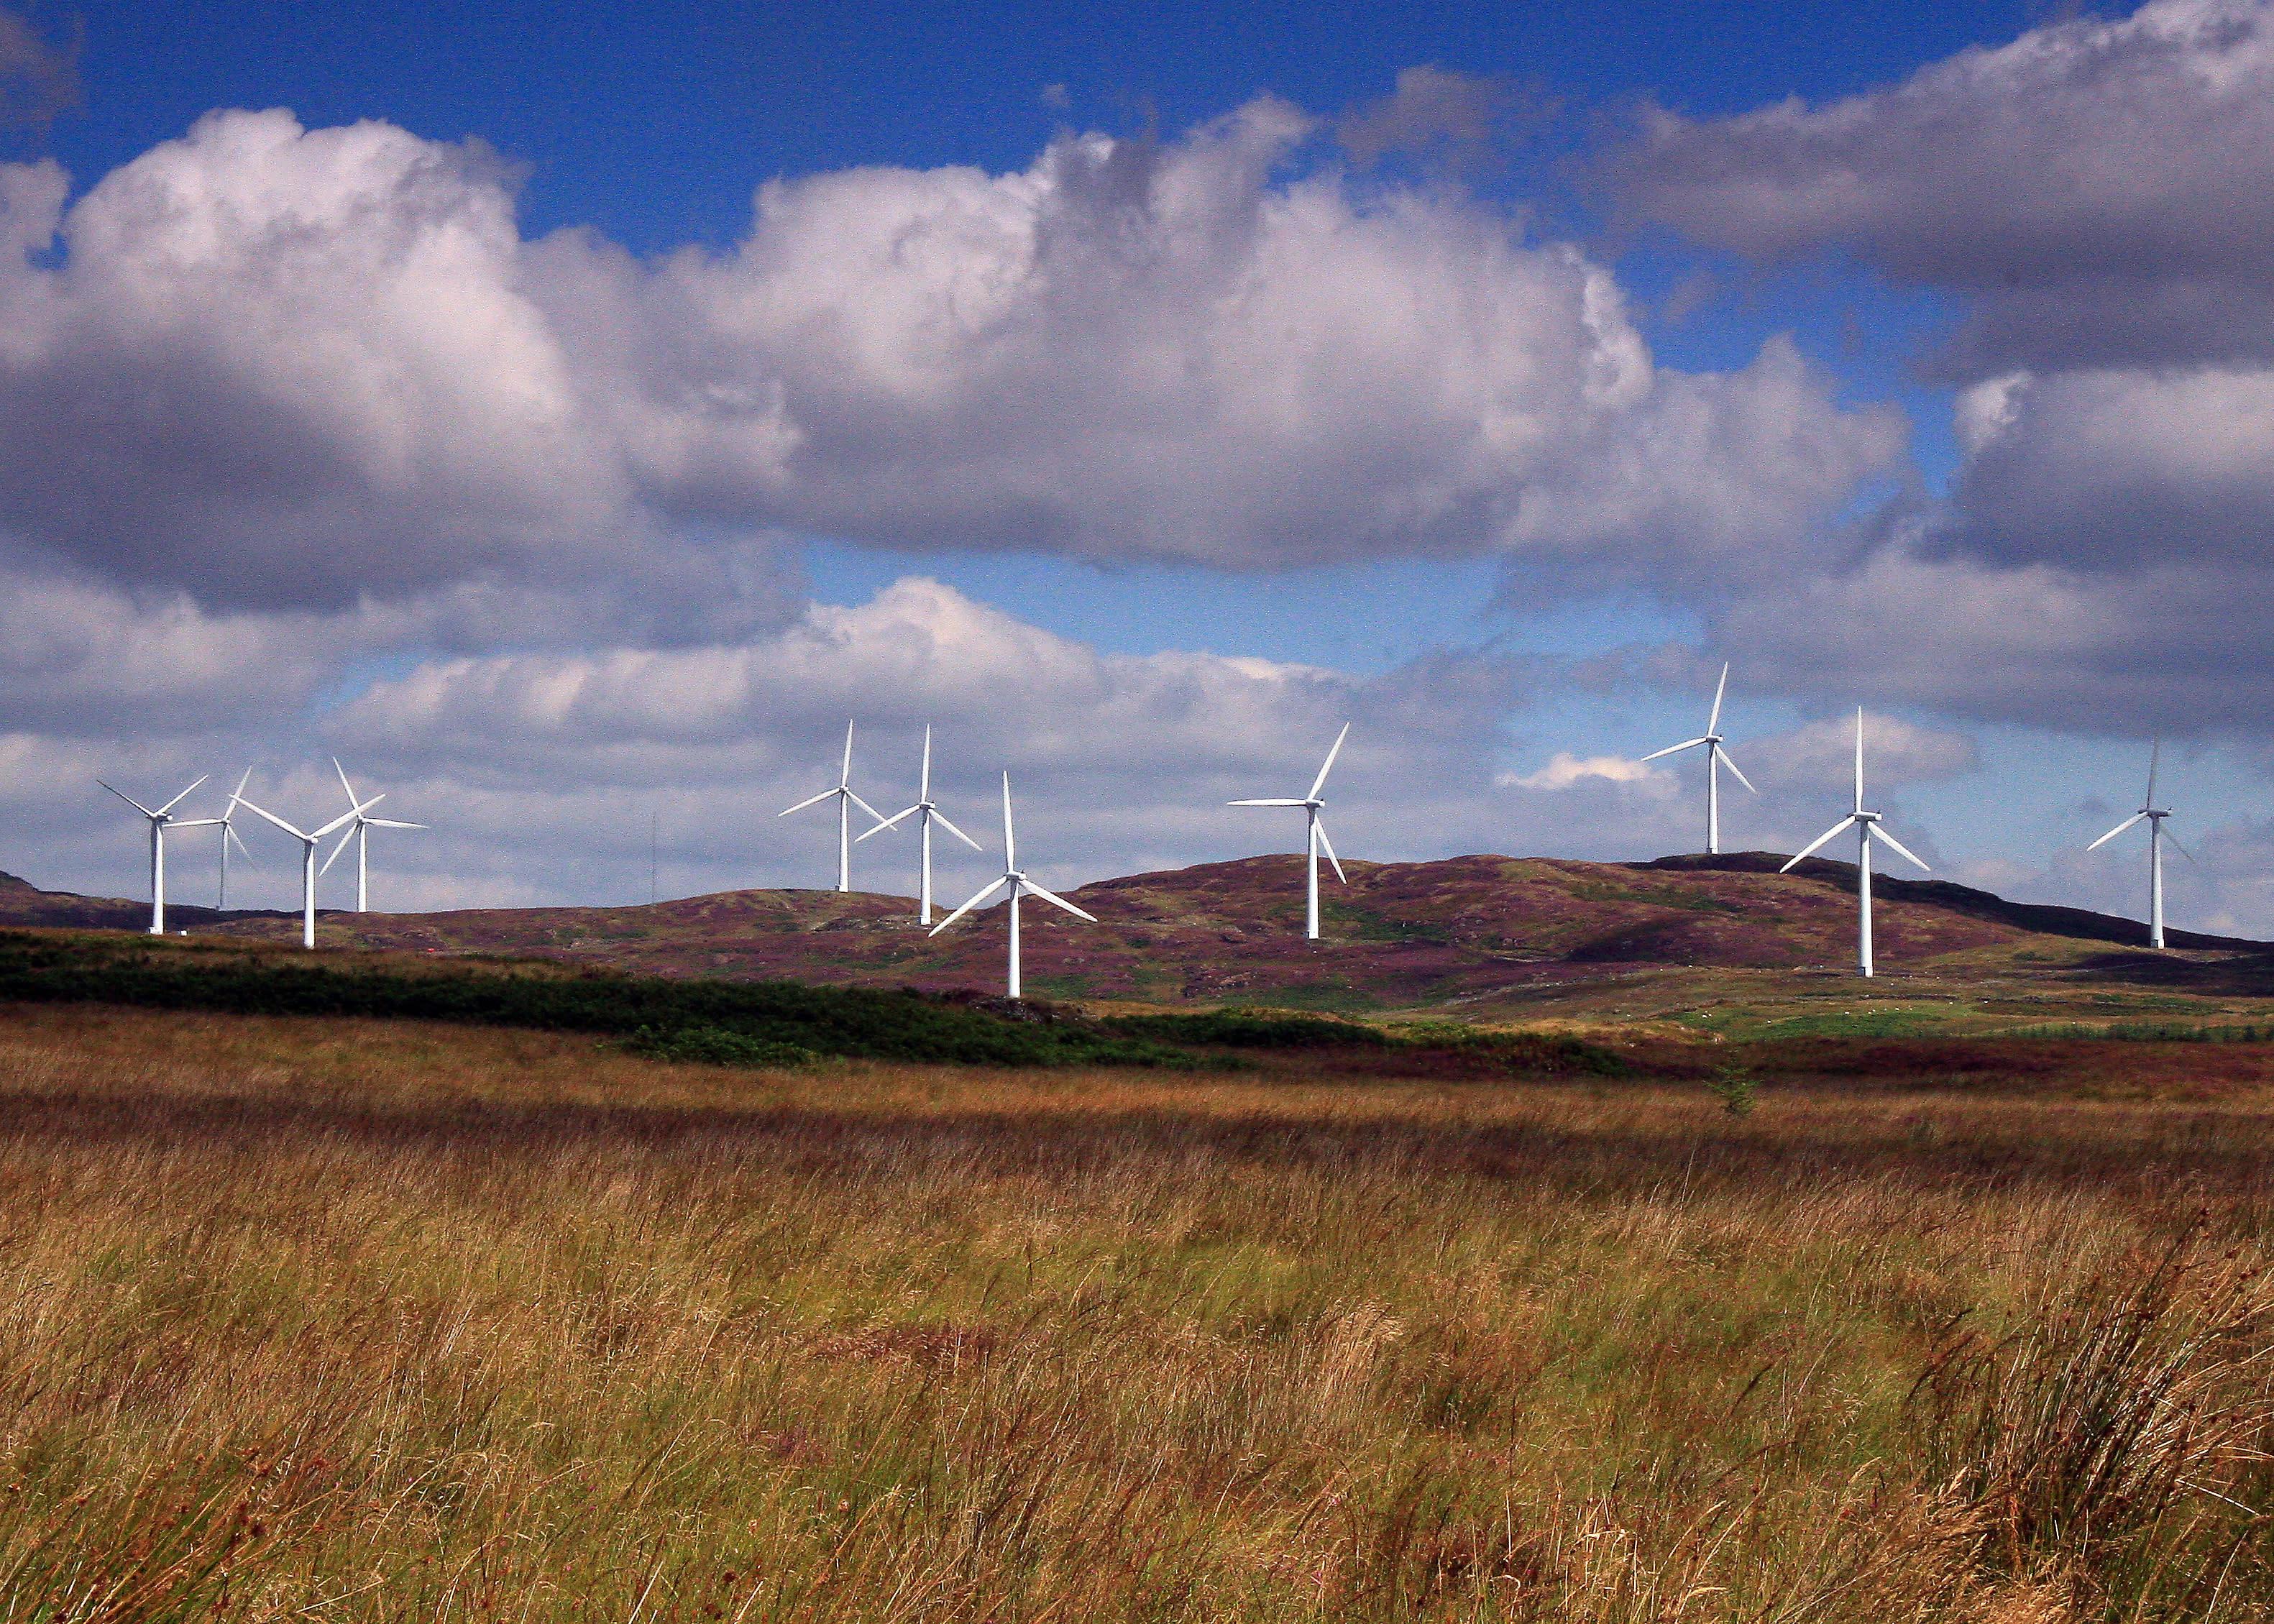 Artfield Fell Wind Farm